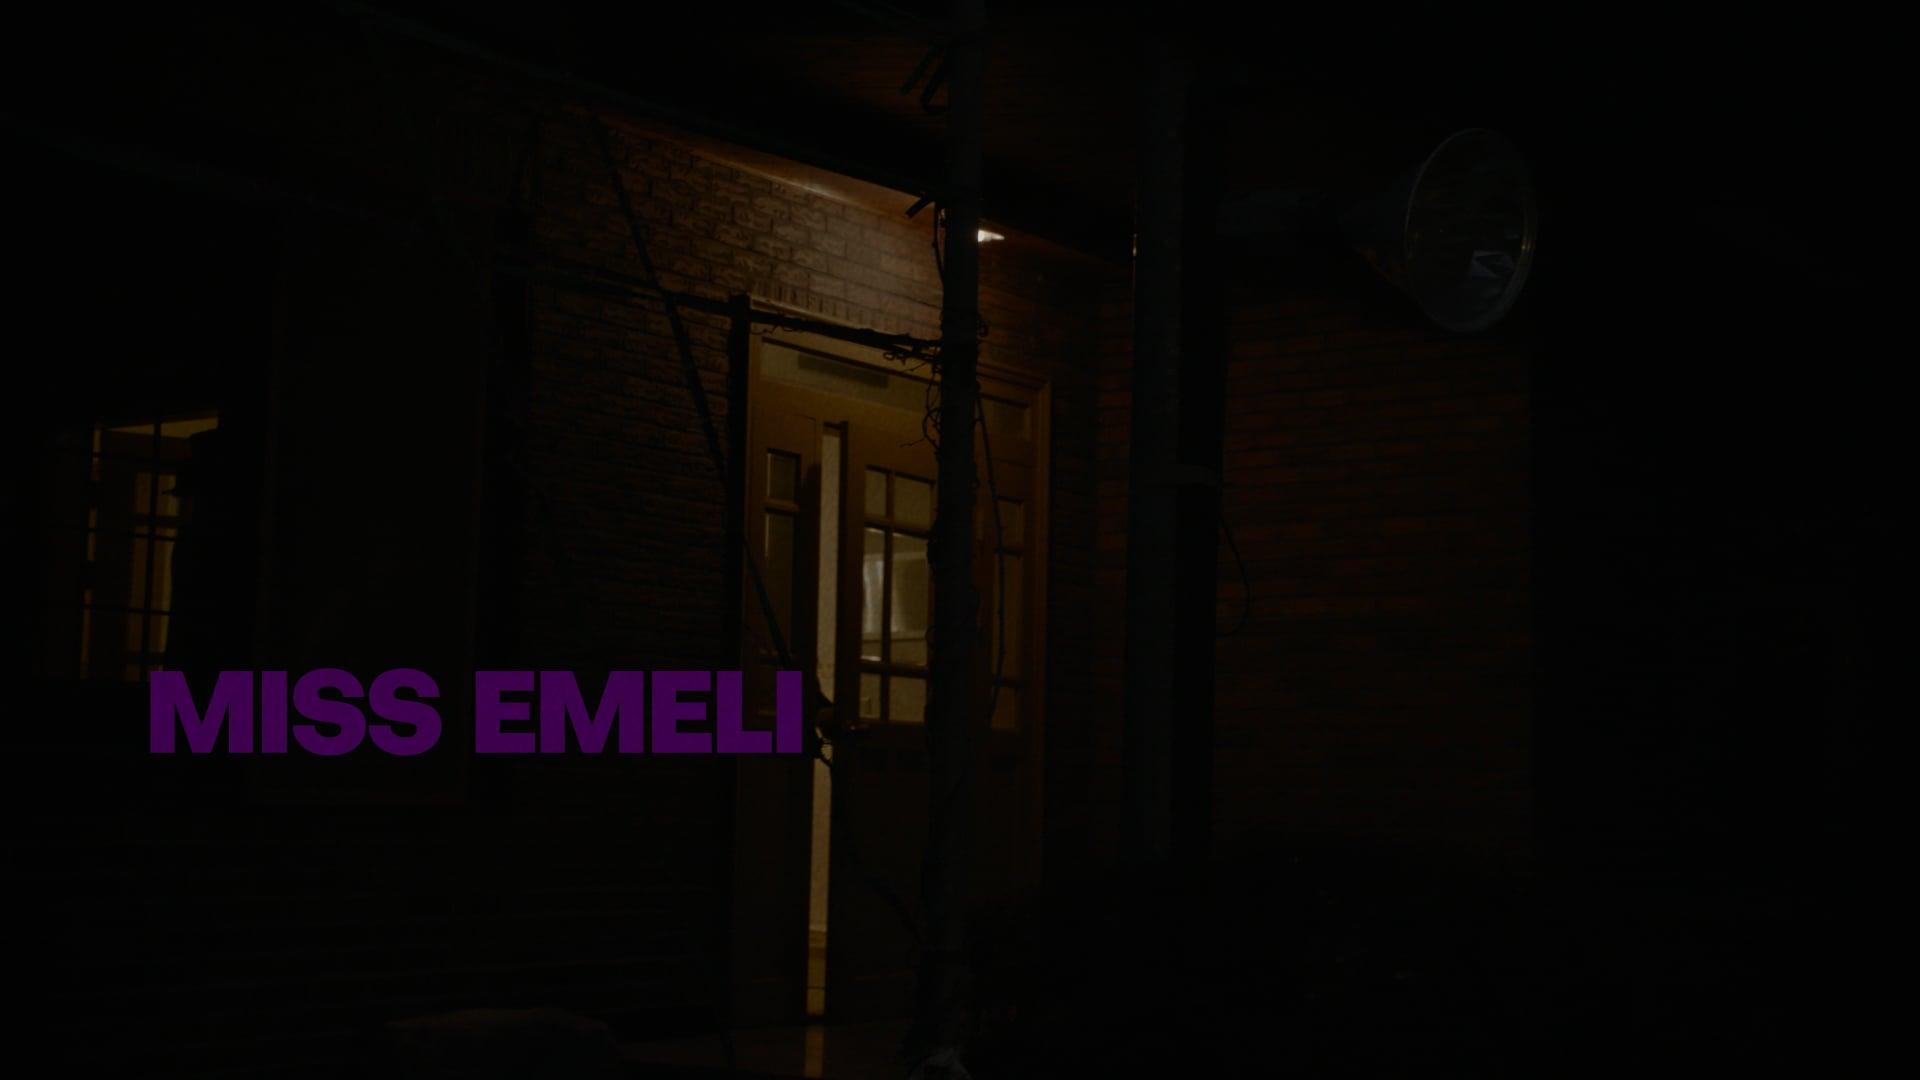 MISS EMELI